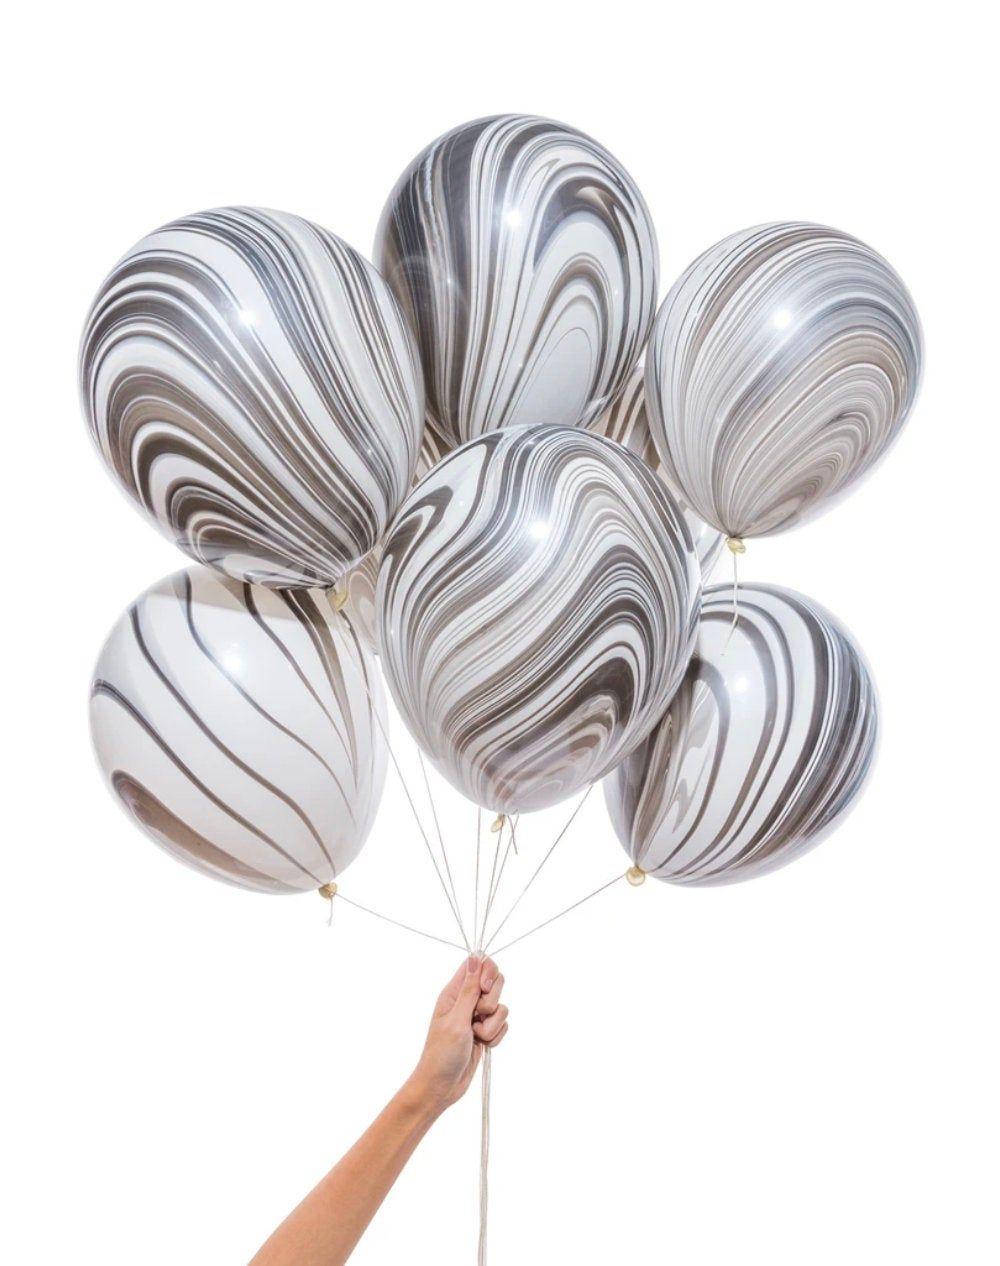 Black & White Marble Balloons Set of 8 Balloons 11 inch